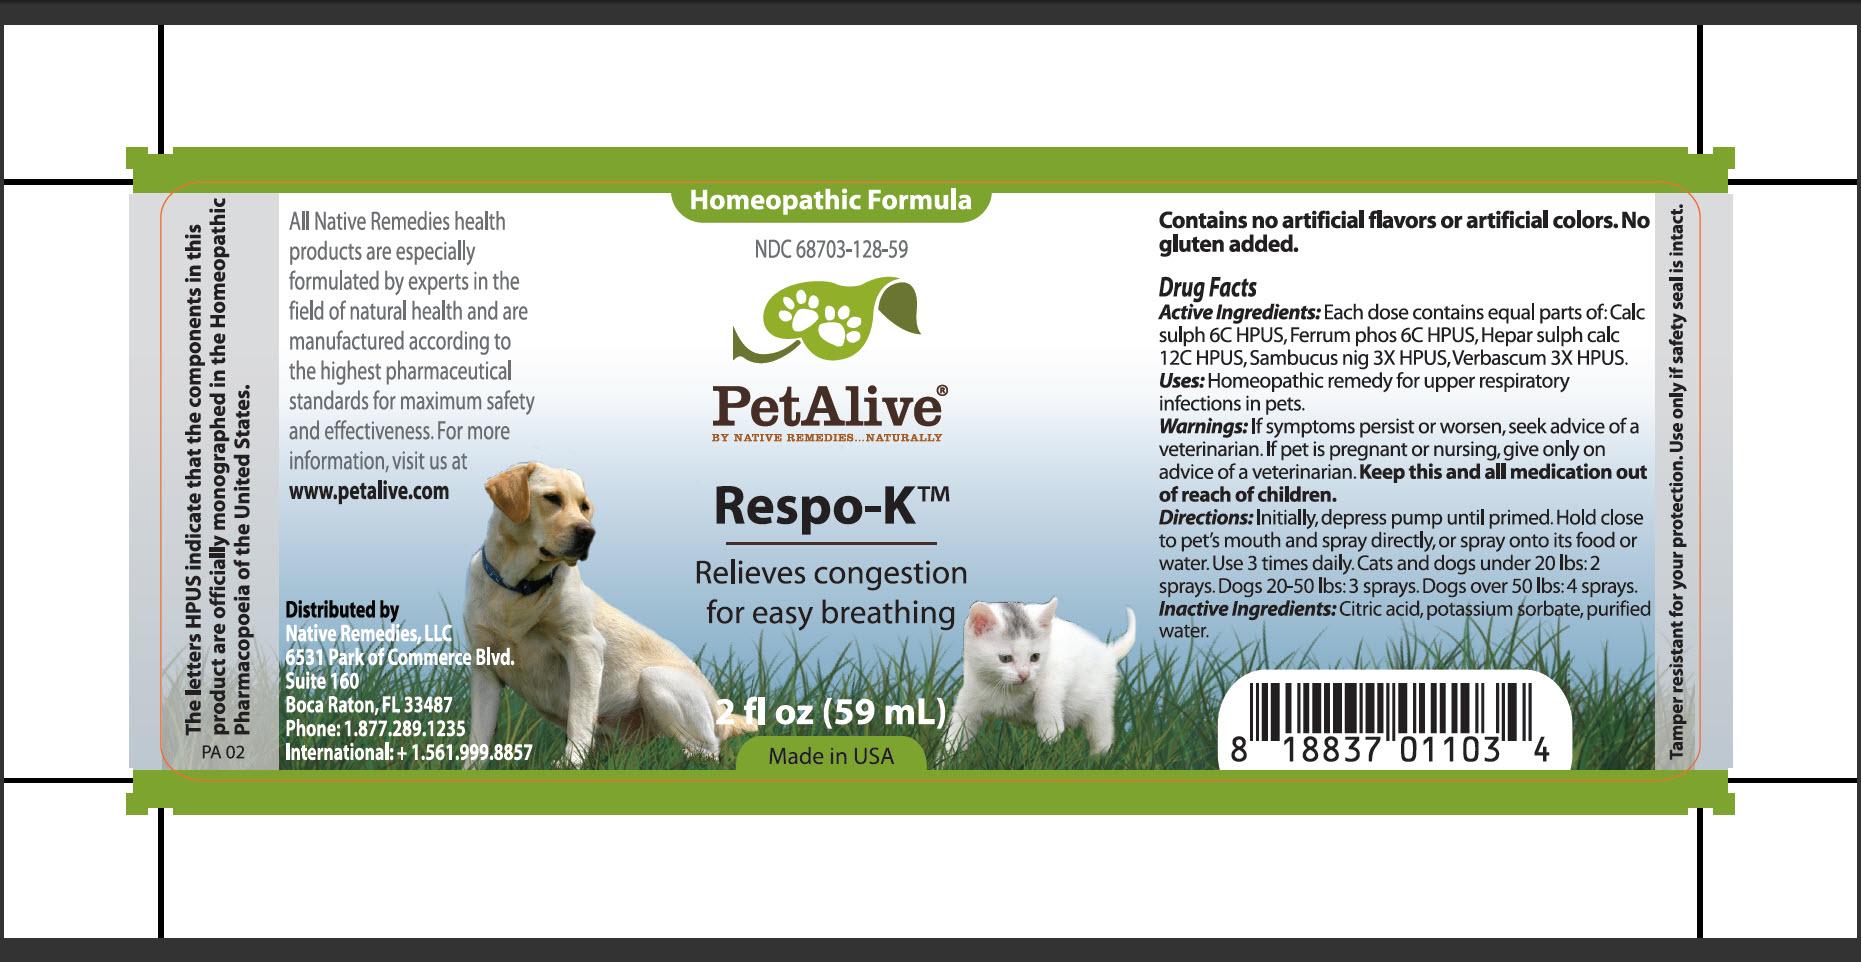 Petalive Respo-k (Calc Sulph, Ferrum Phos, Hepar Sulph Calc, Sambucus Nig, Verbascum) Spray [Native Remedies, Llc]